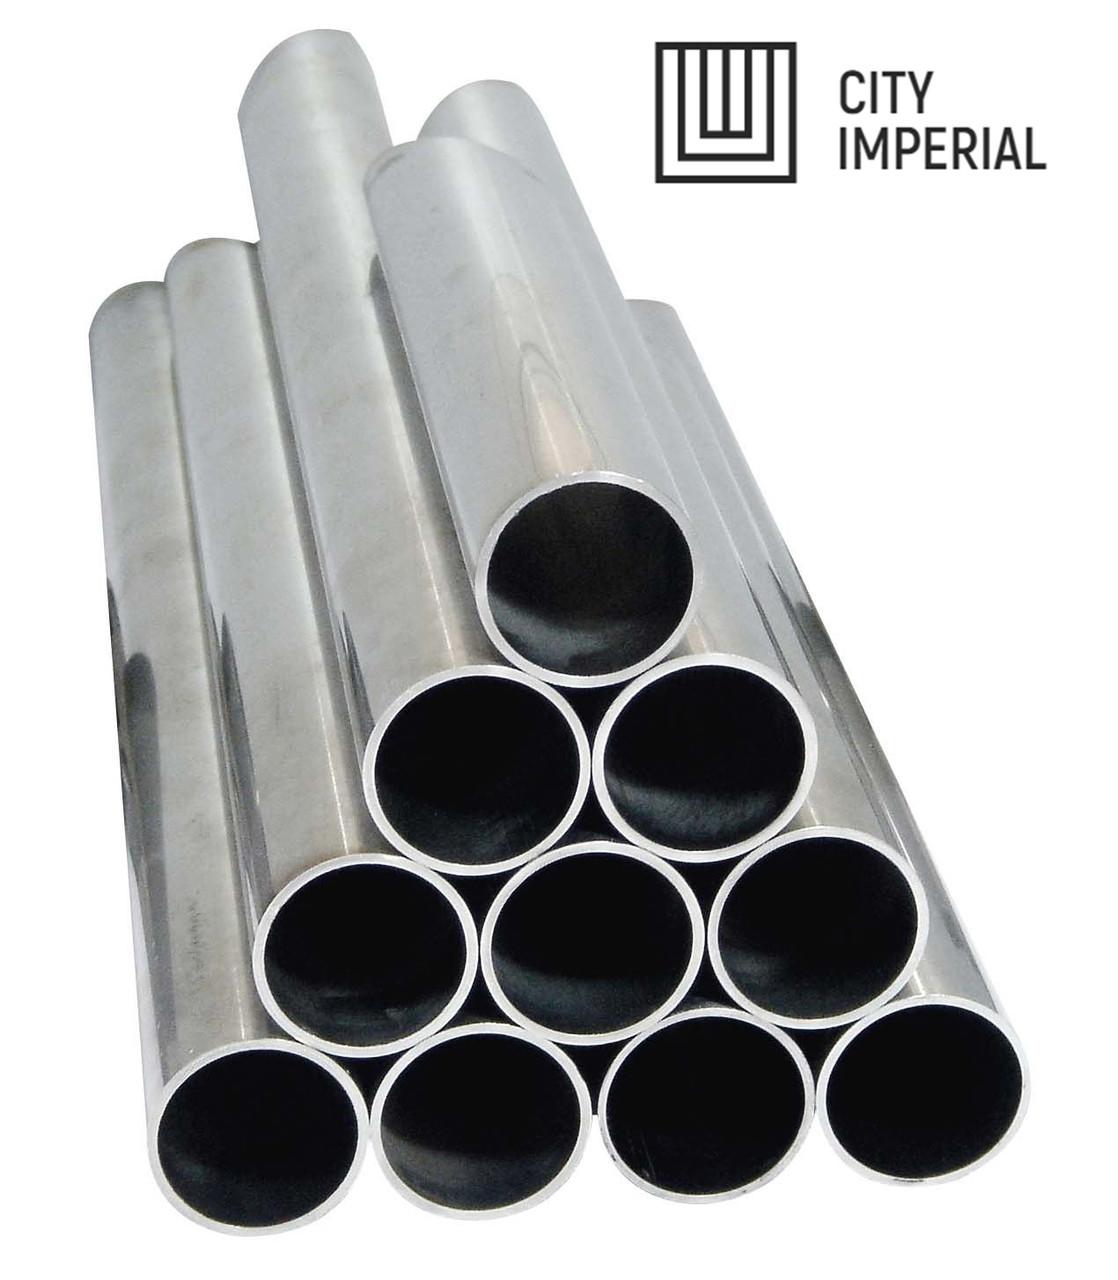 Труба 351 х 40 сталь 20